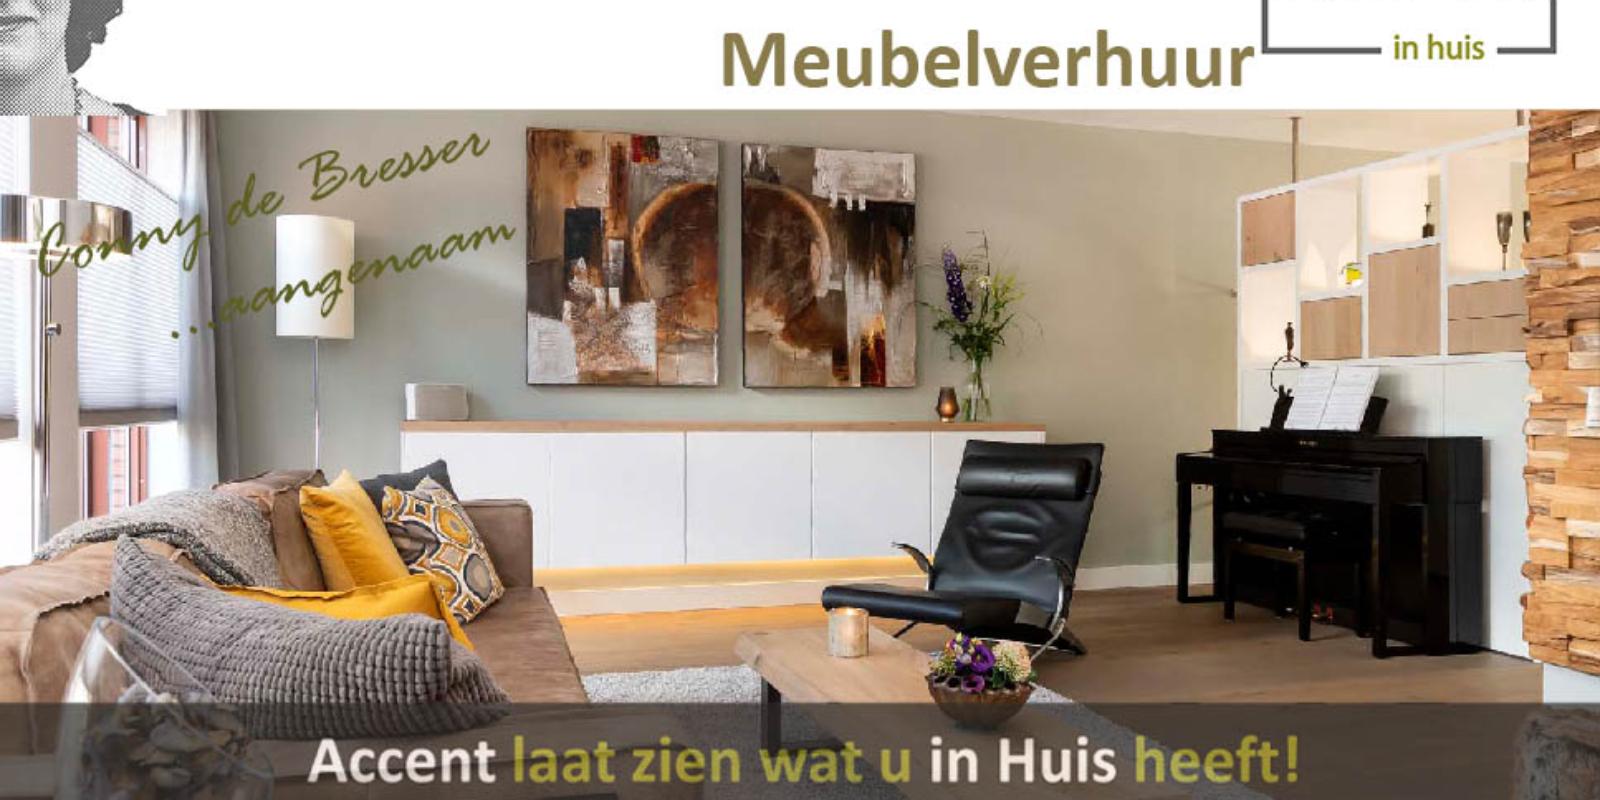 homebnscrispdomainsbnscrisp.nlpublic_htmlwp-contentuploads202011hoofdfoto-website-CRISP.jpg